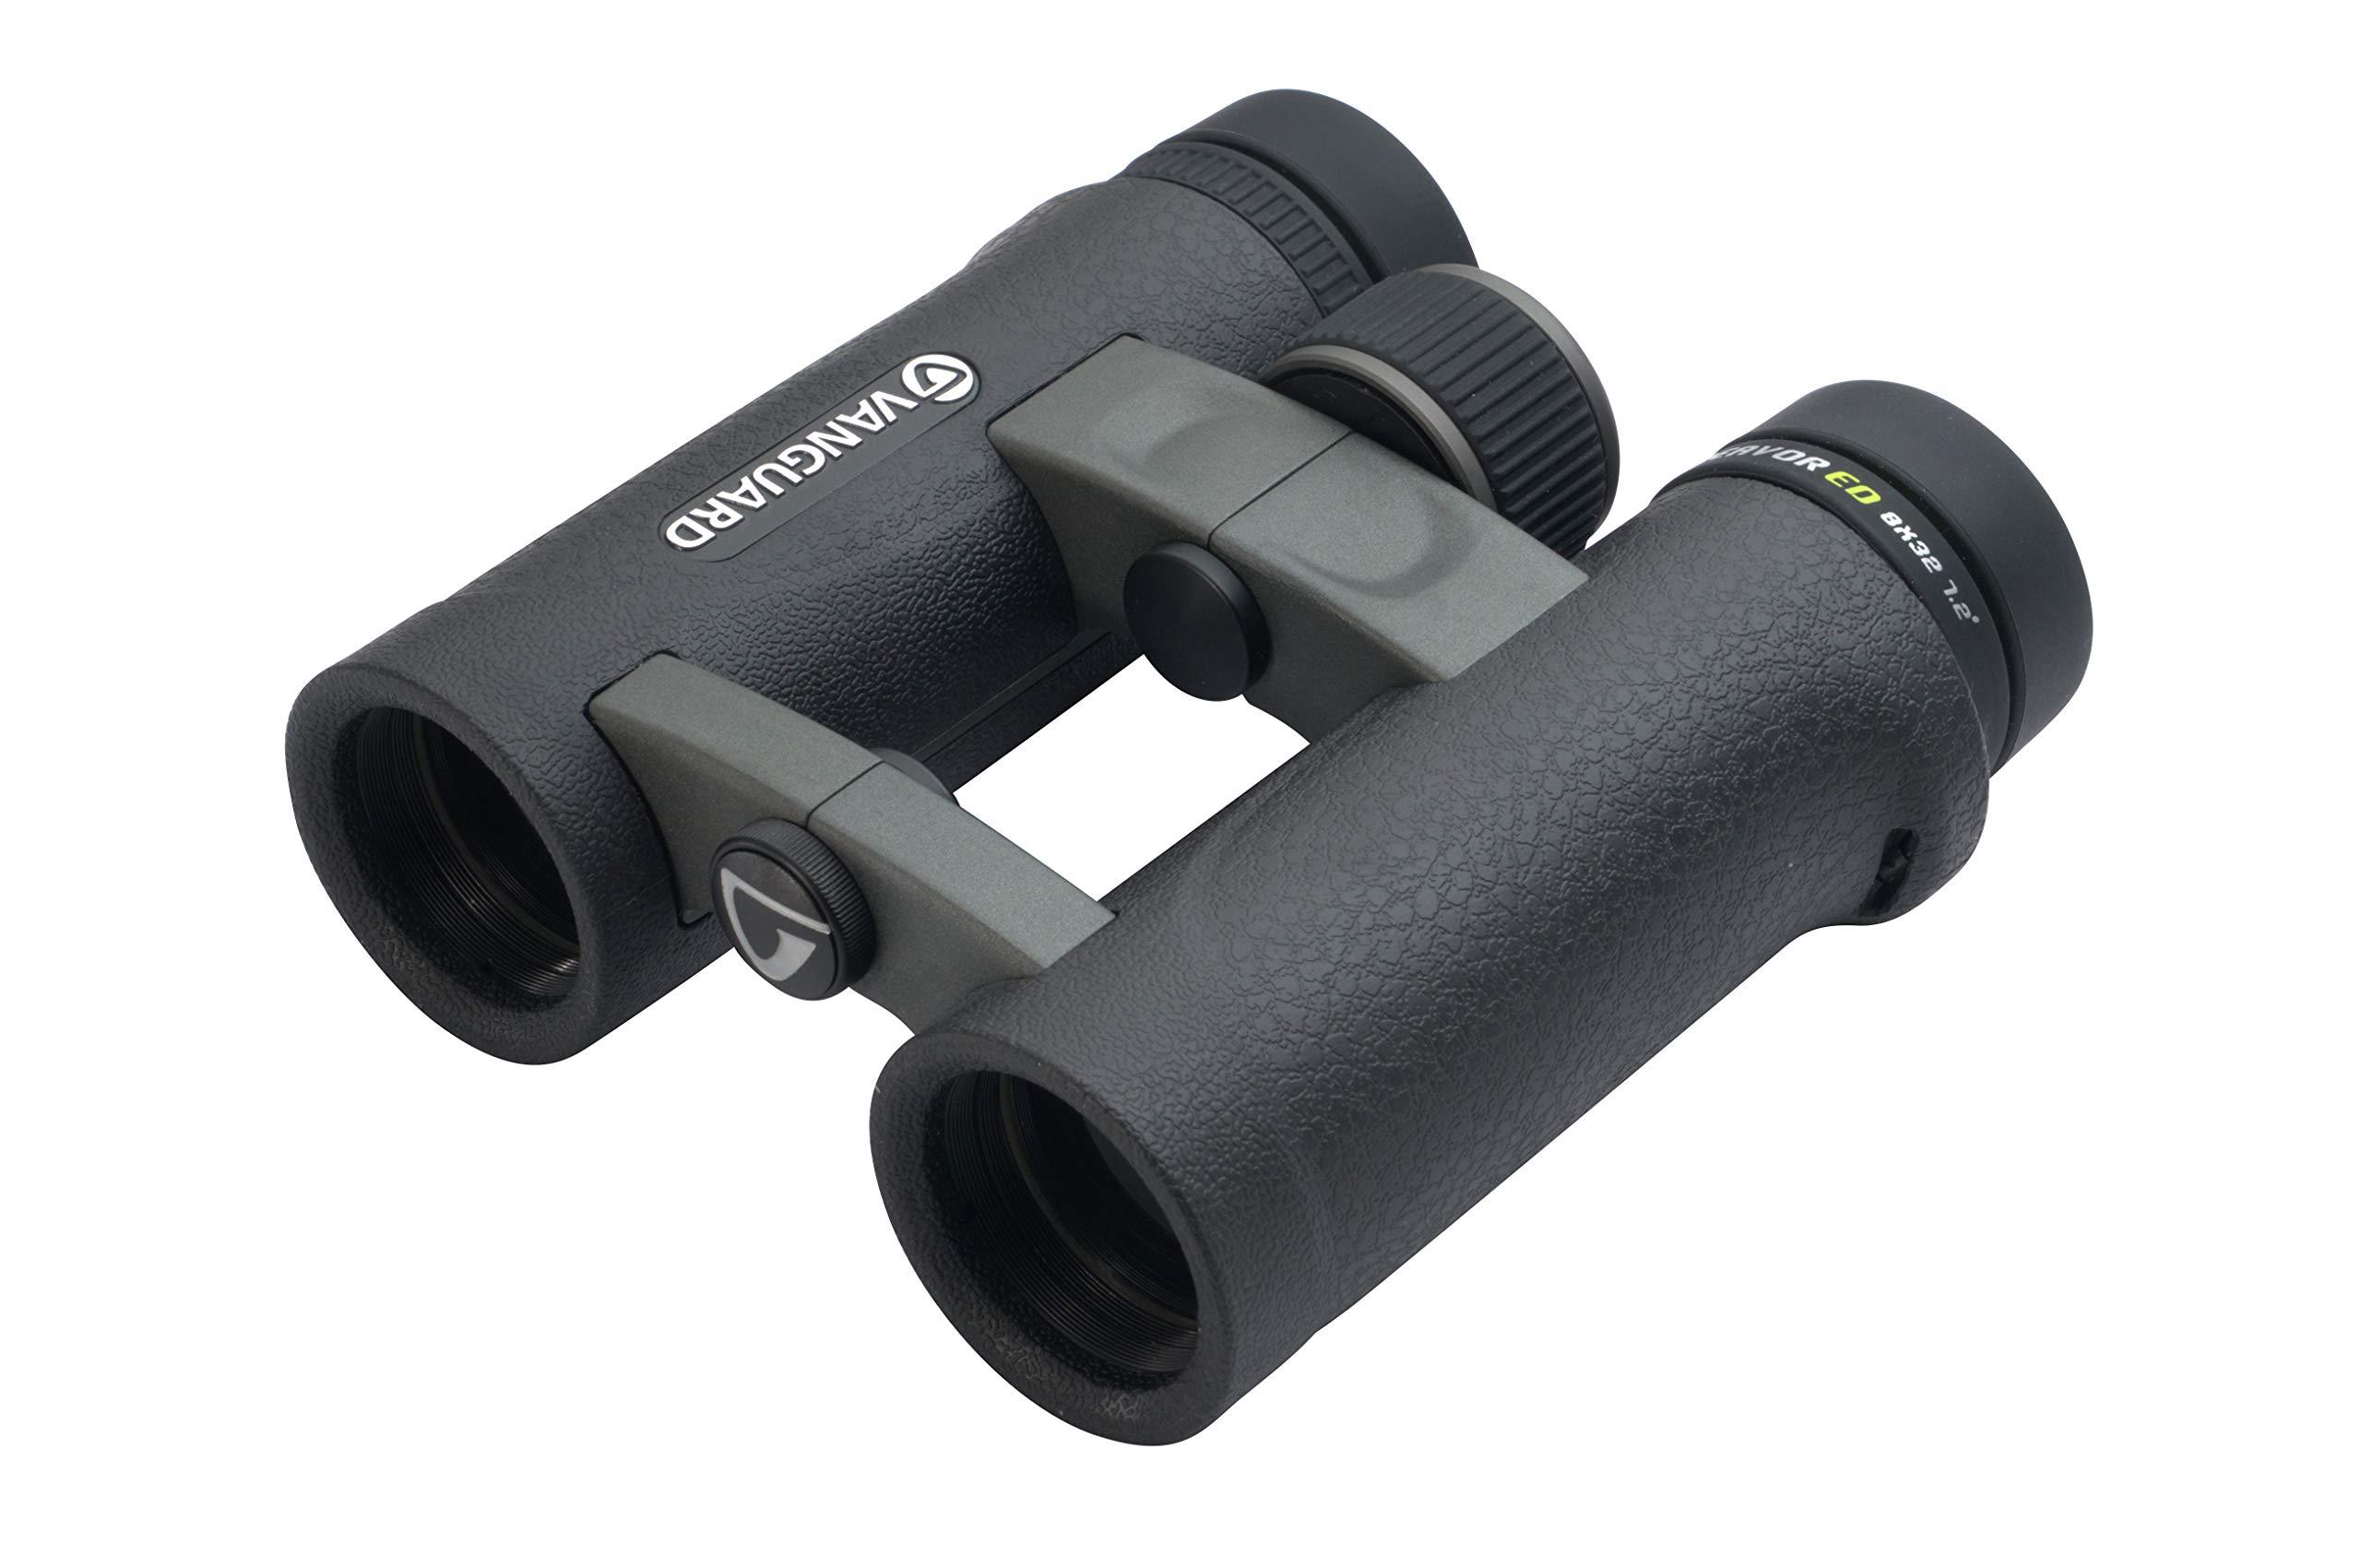 Vanguard Endeavor ED 8x32 Binocular, ED Glass, Waterproof/Fogproof by Vanguard